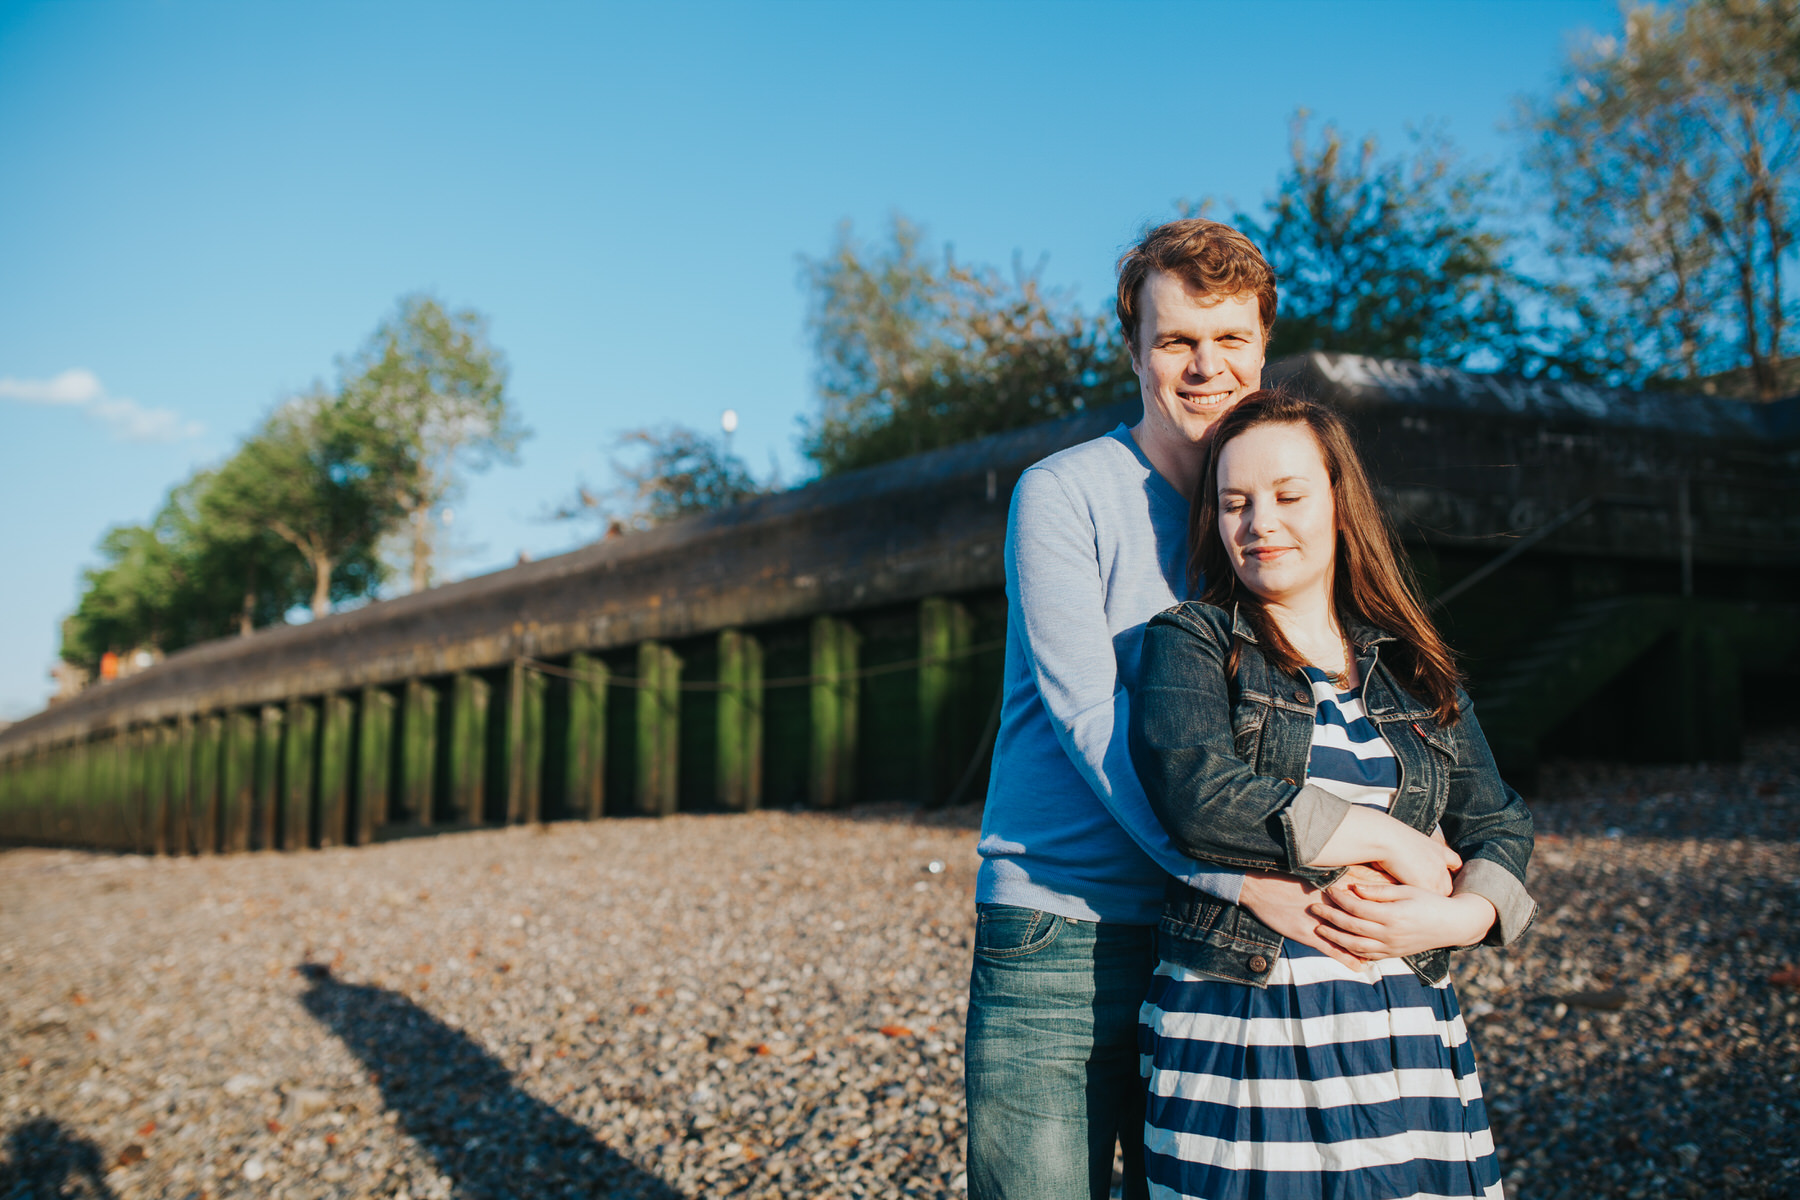 35-Quirky-engagement-London-golden-hour-couple.jpg